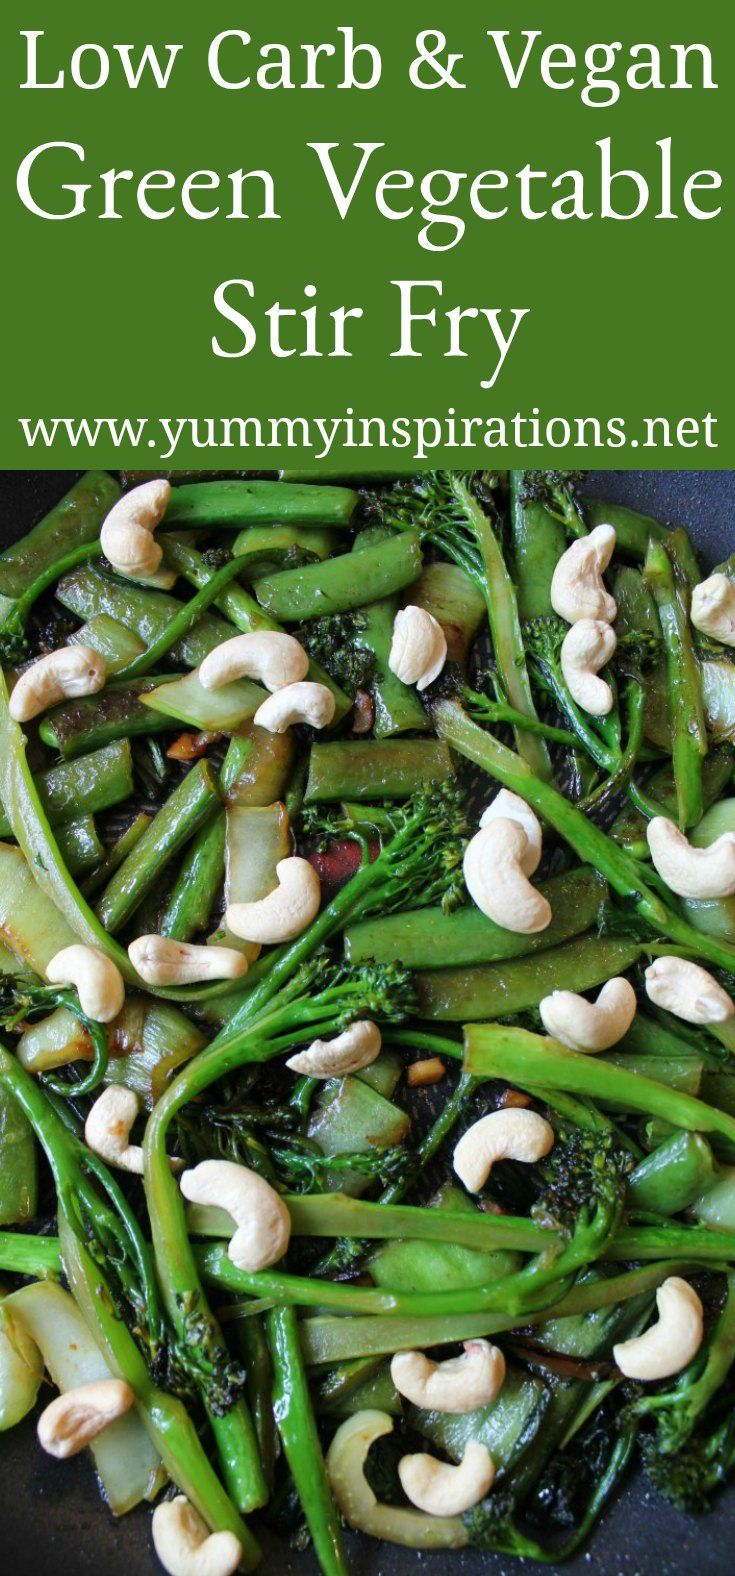 Photo of Low Carb Green Vegetable Stir Fry Recipe – Vegan Stir Fry Recipes